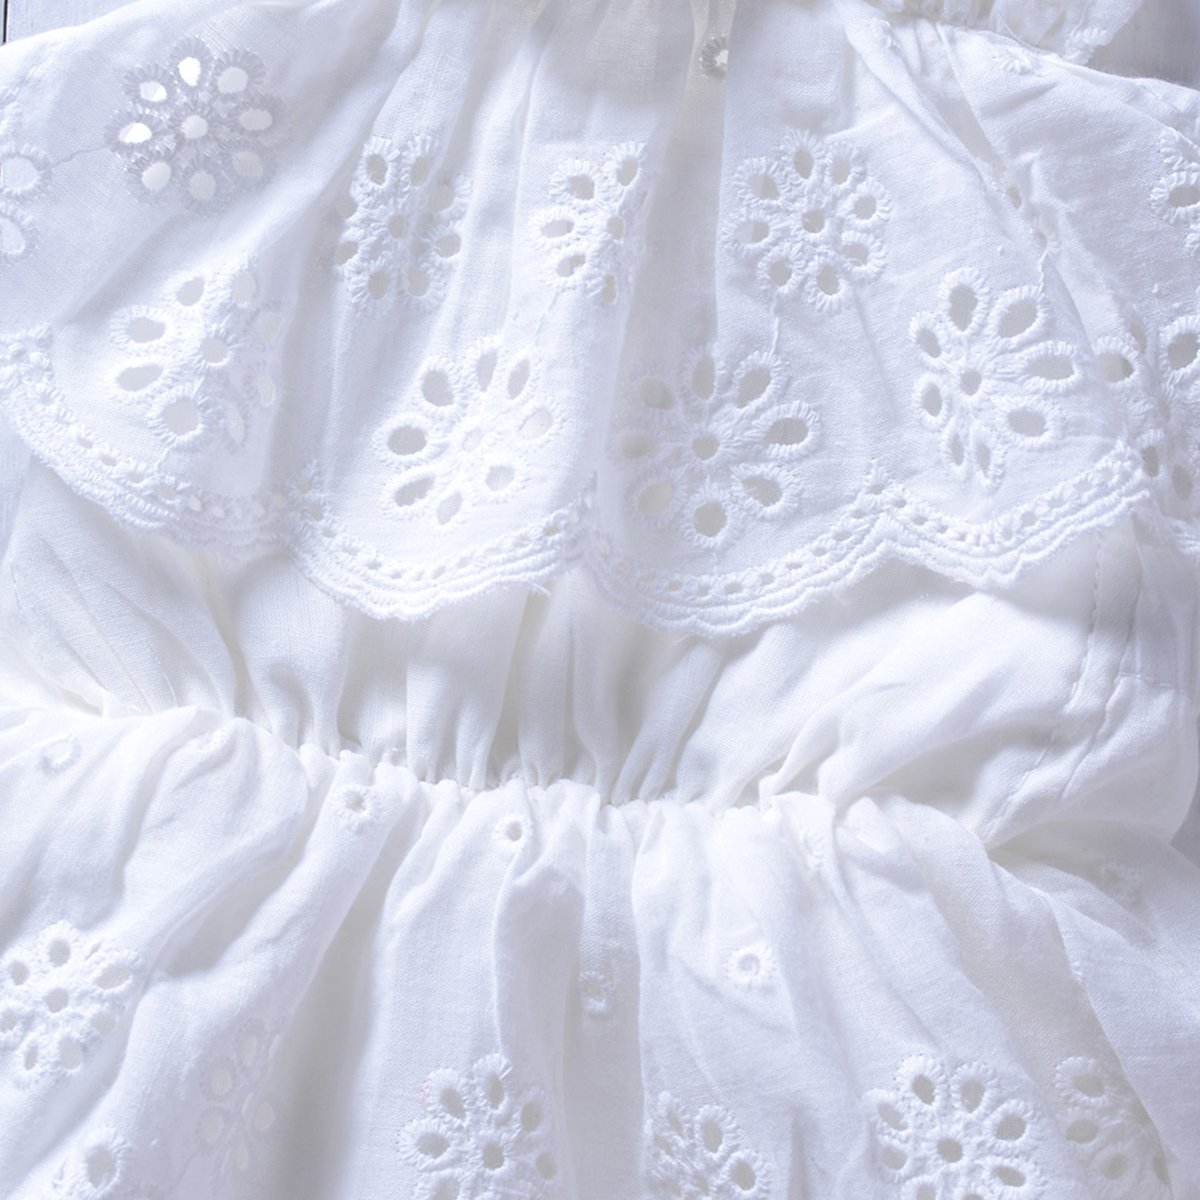 Camidy Infant Baby Girl White Ruffled Halter Lace Romper Sunsuit Bodysuit Jumpsuit